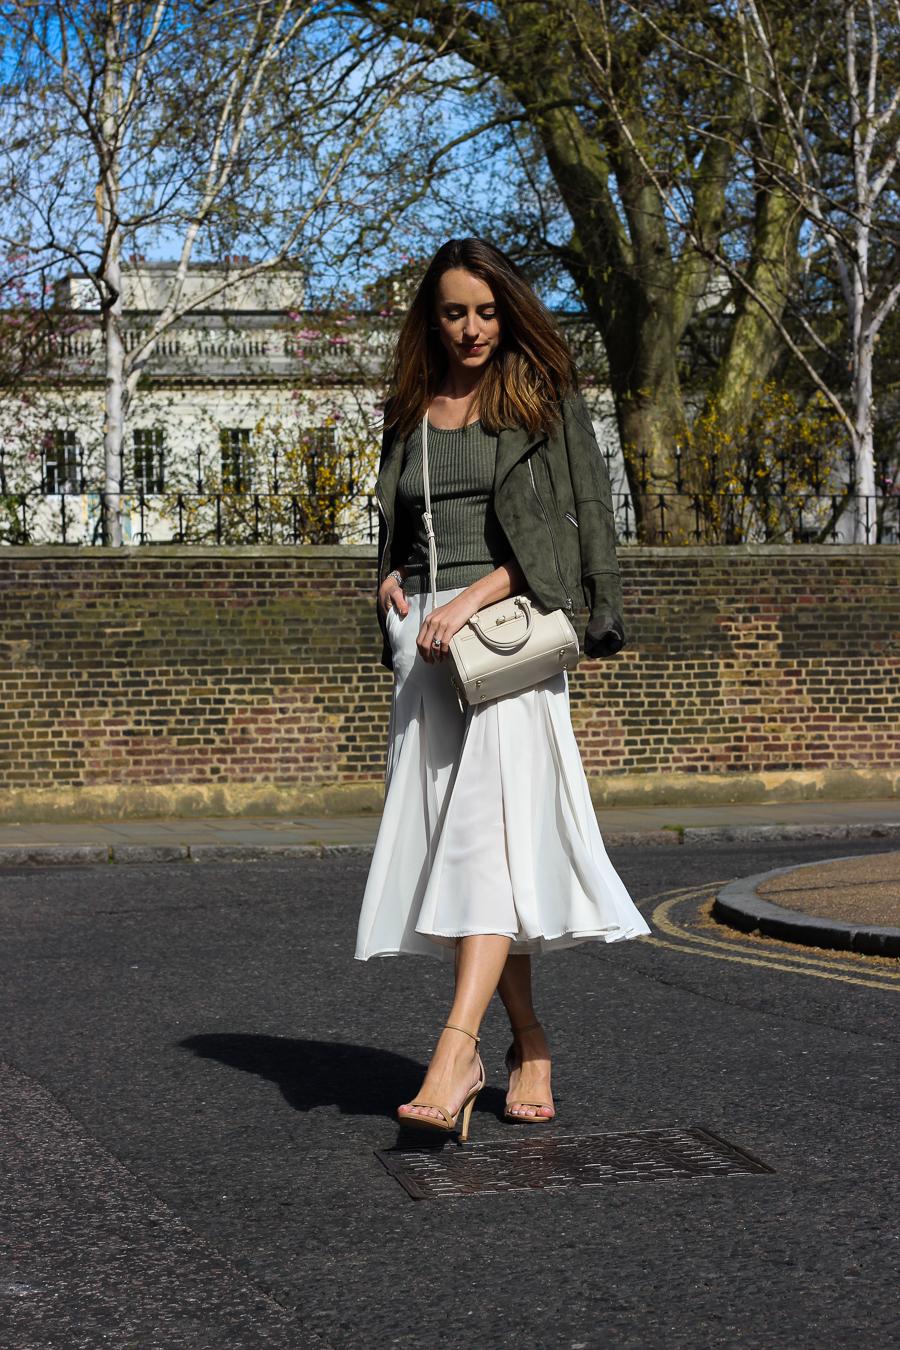 Folli Follie UK - Clutch and carry on - uk travel blogger, uk fashion blogger, london street style, sabrina chakici tblogger-49